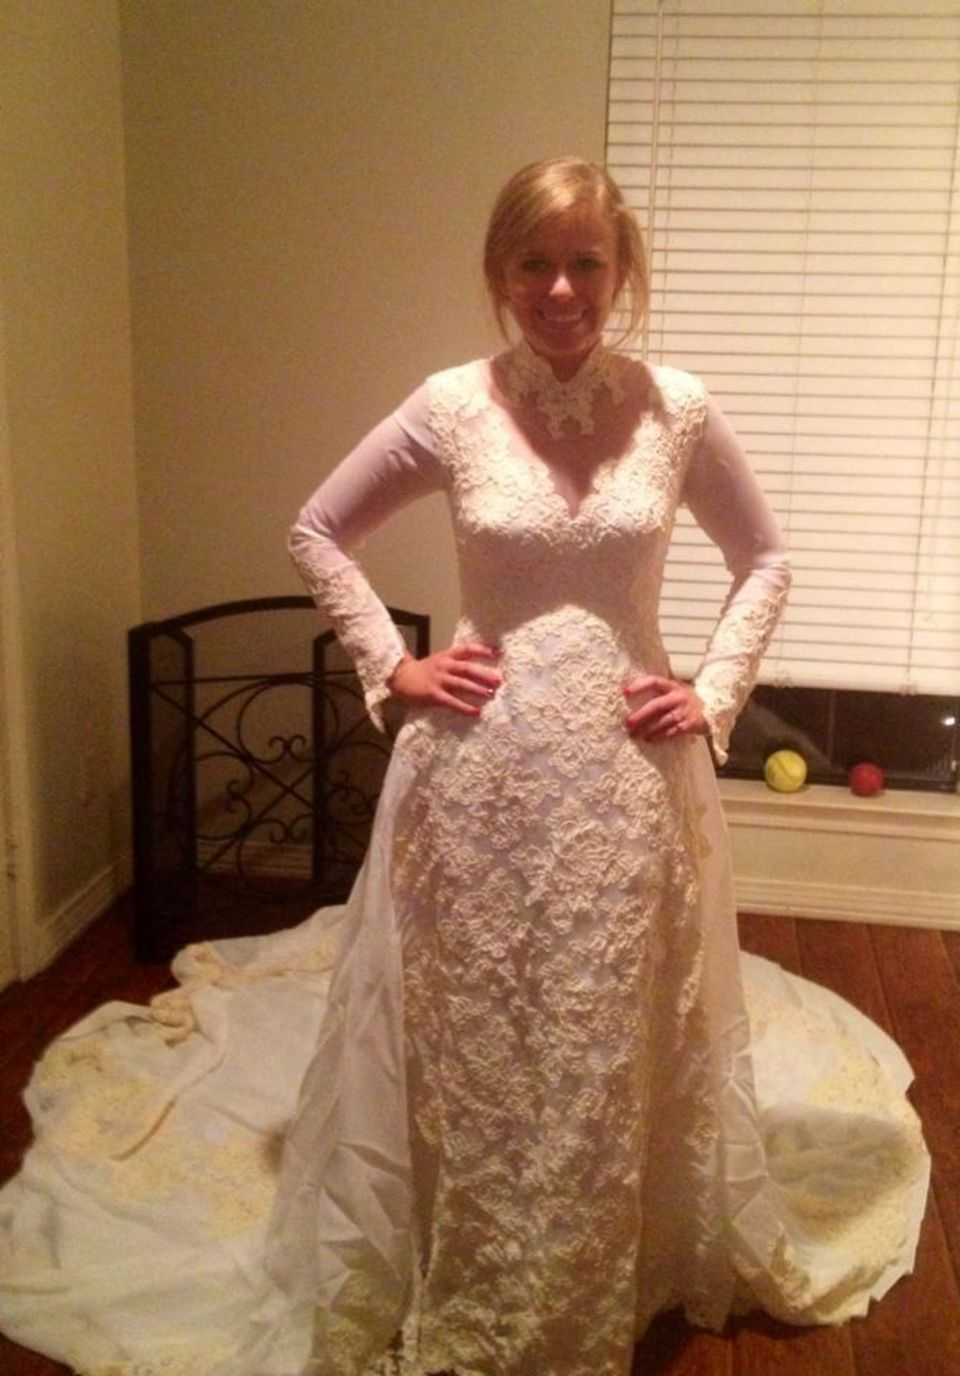 Wedding dress huntsville al  Valerie Bell said uyesu to her momus dress when she married Coleman